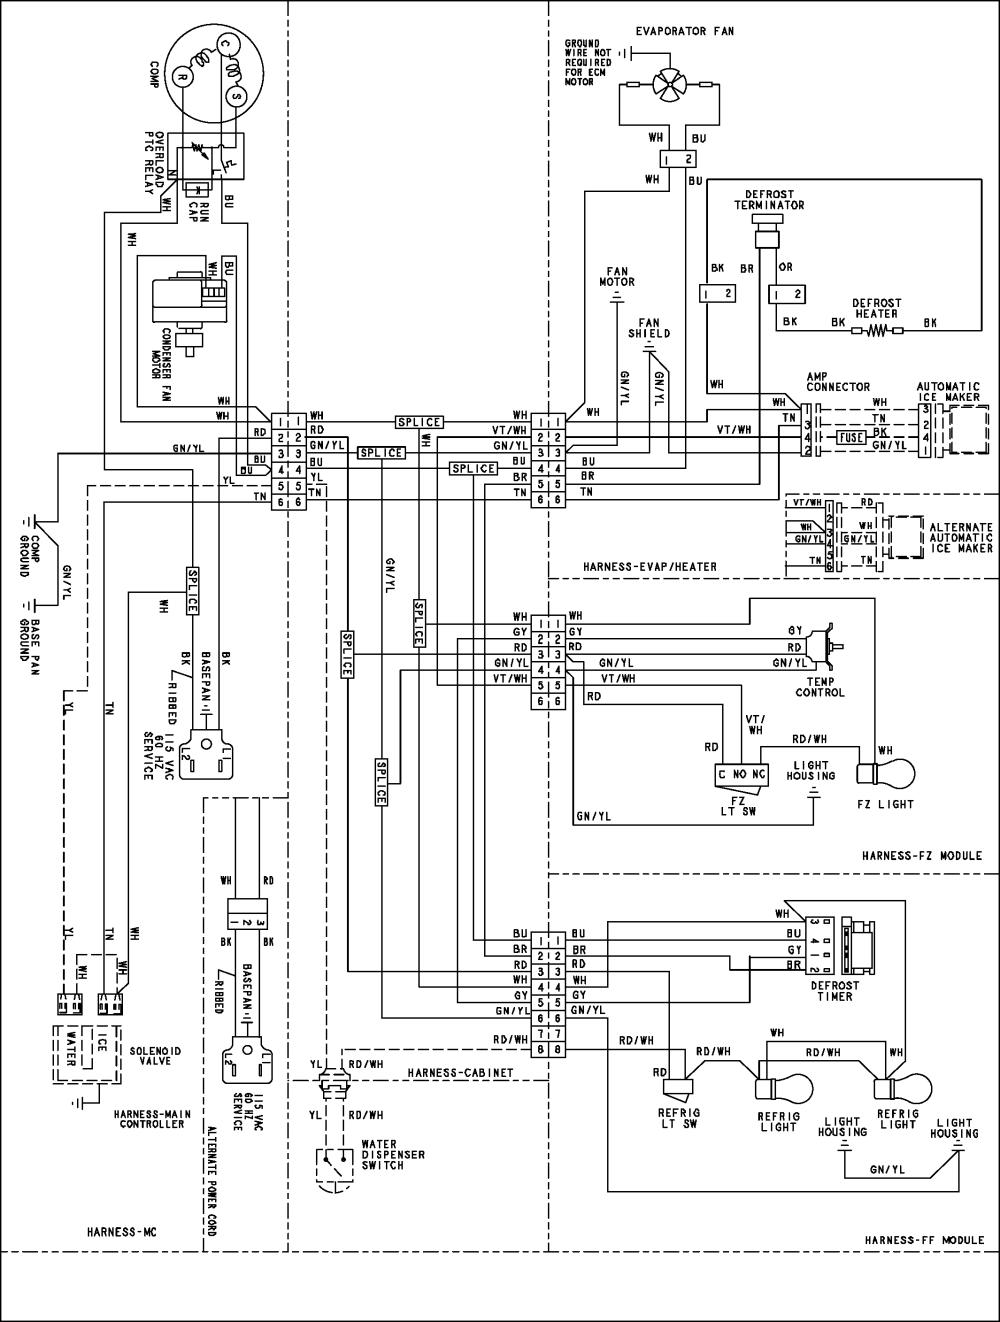 medium resolution of diagram kenmore side by side refrigerator parts diagram free ebook